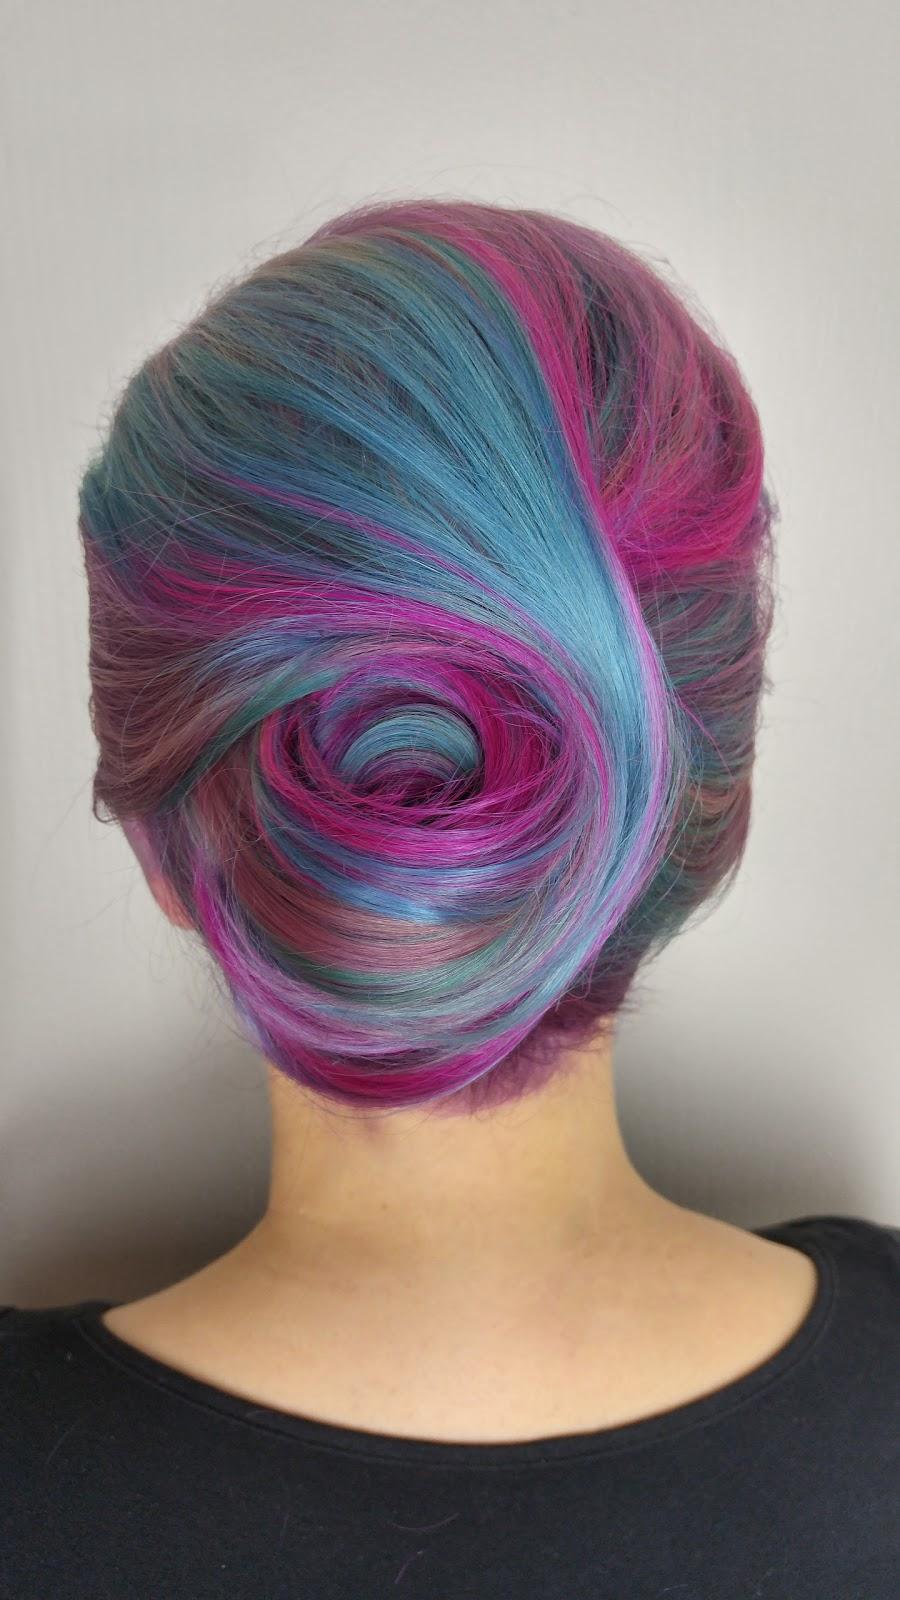 Life of Hair   hair care   108-2940, Jutland Rd, Victoria, BC V8T 5K6, Canada   2502209744 OR +1 250-220-9744